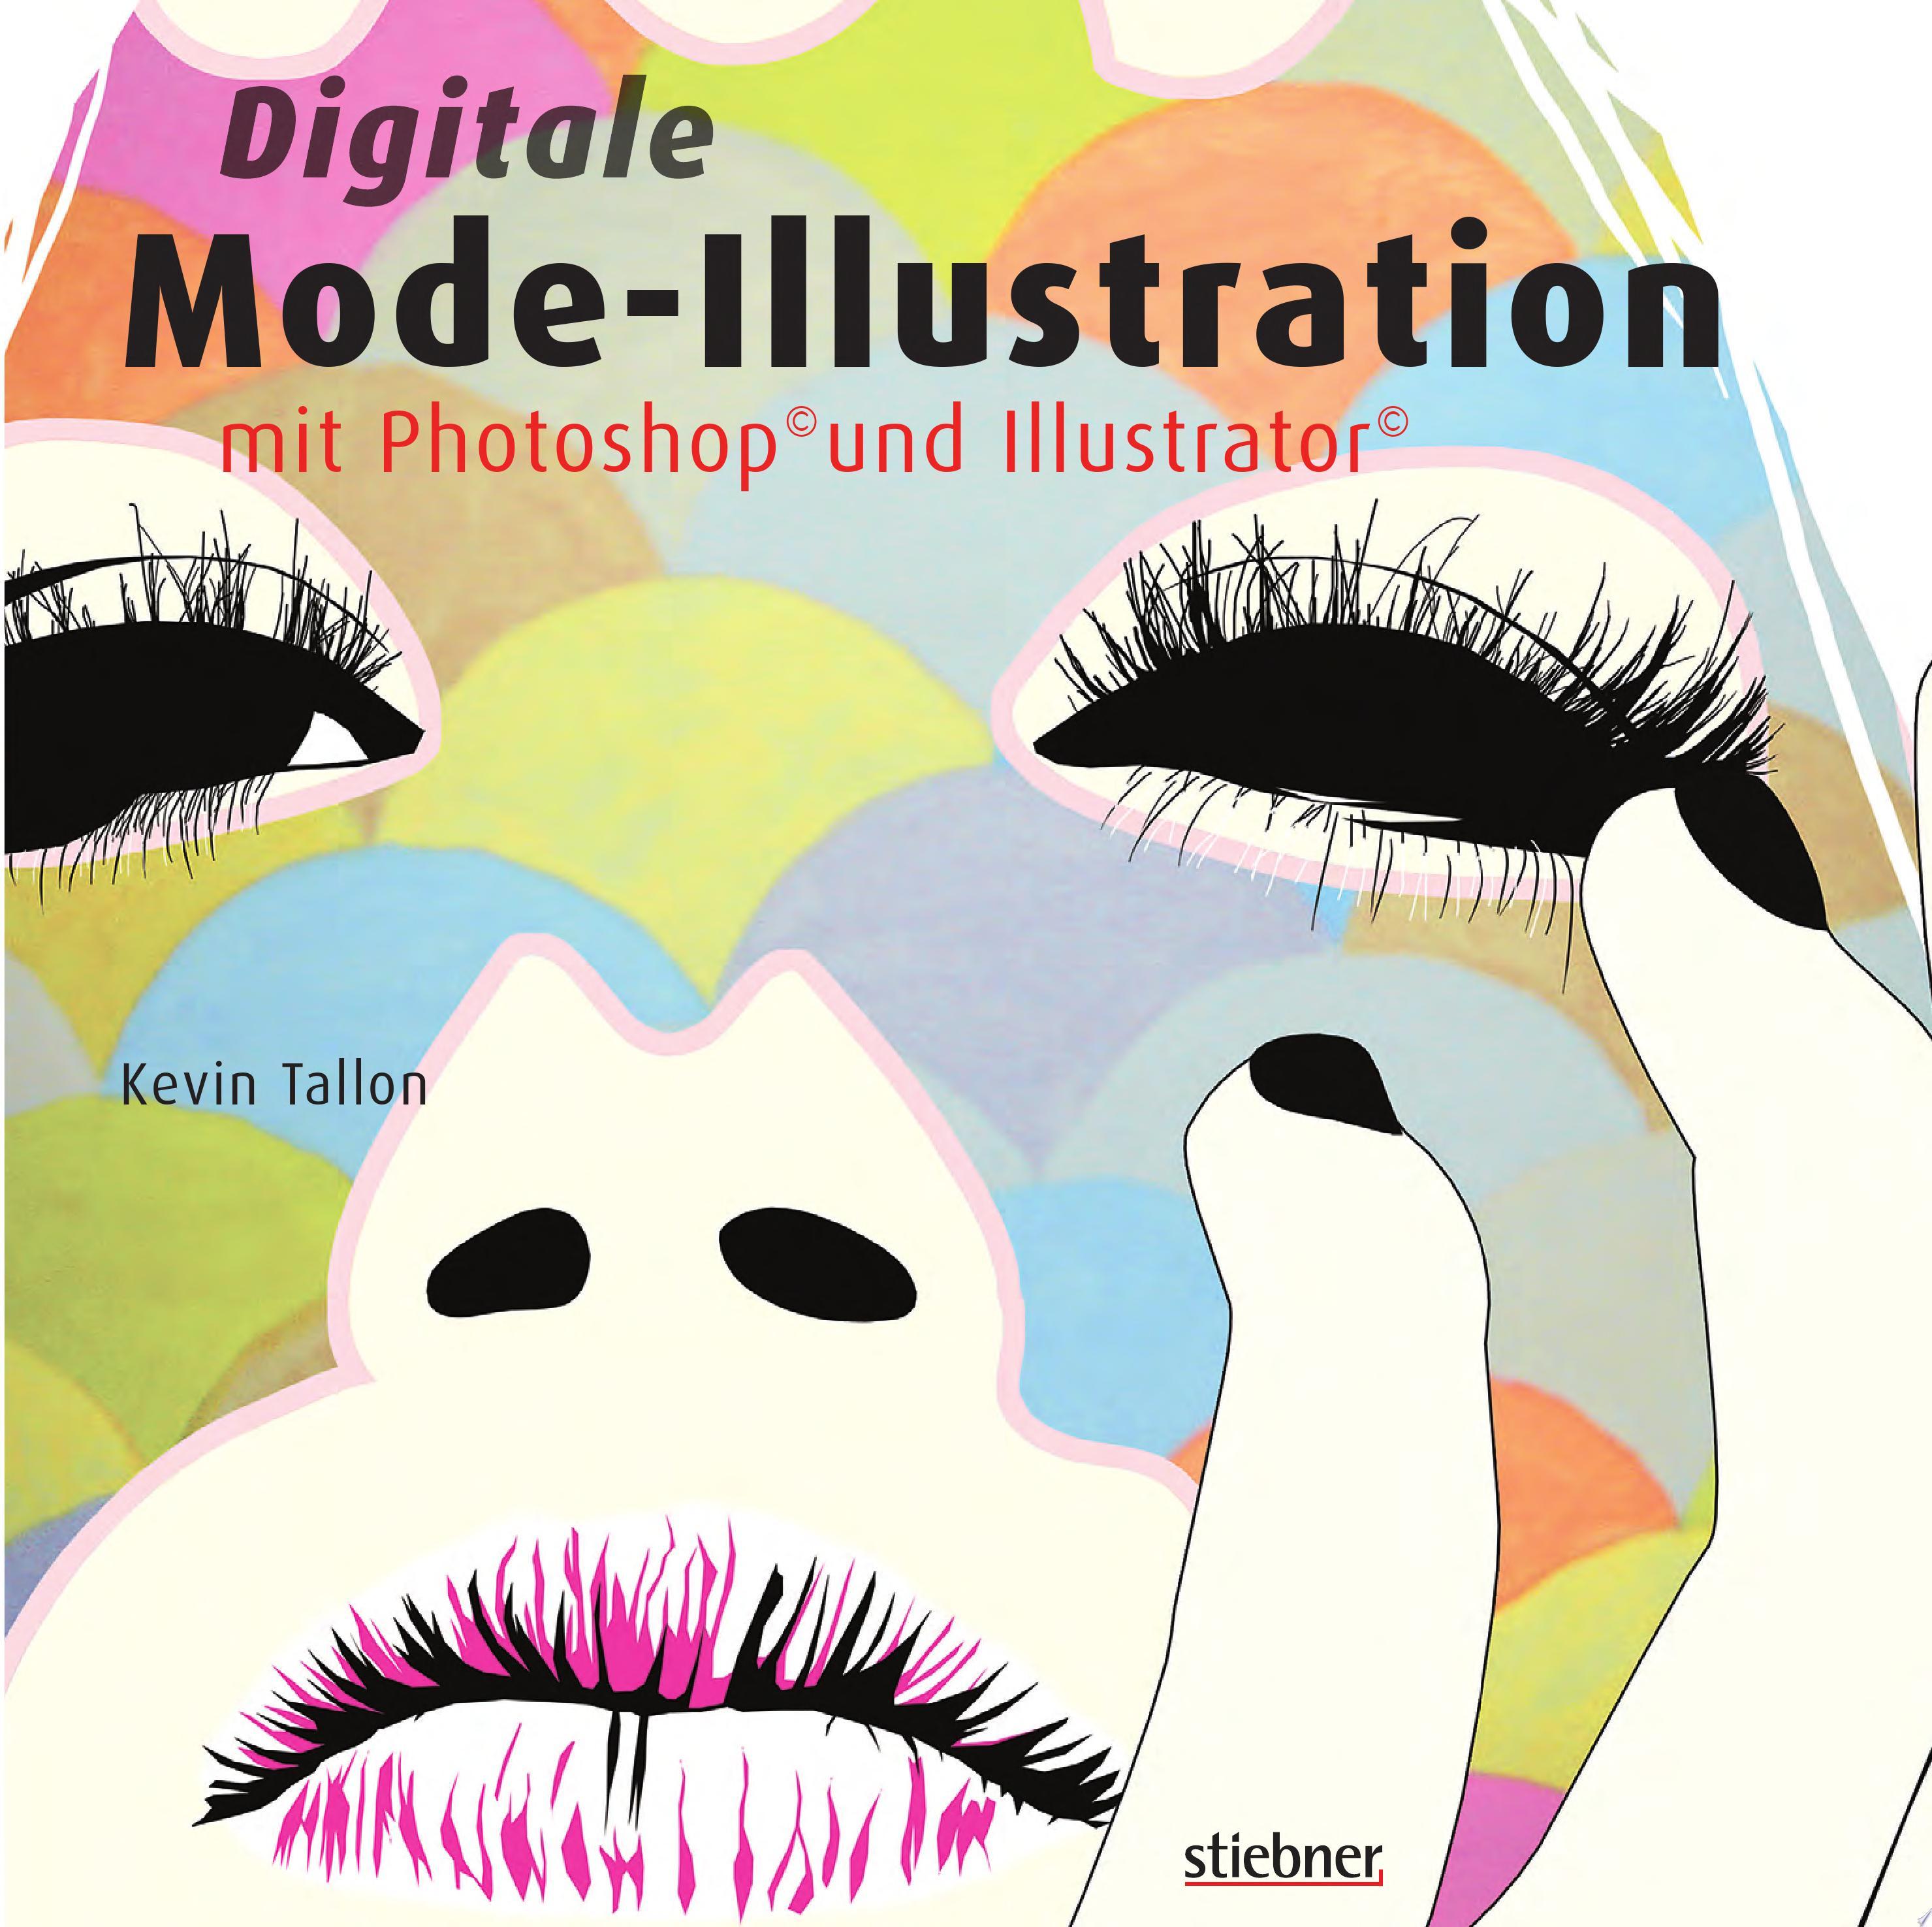 Digitale Mode Illustration mit Photoshop und Illustrator